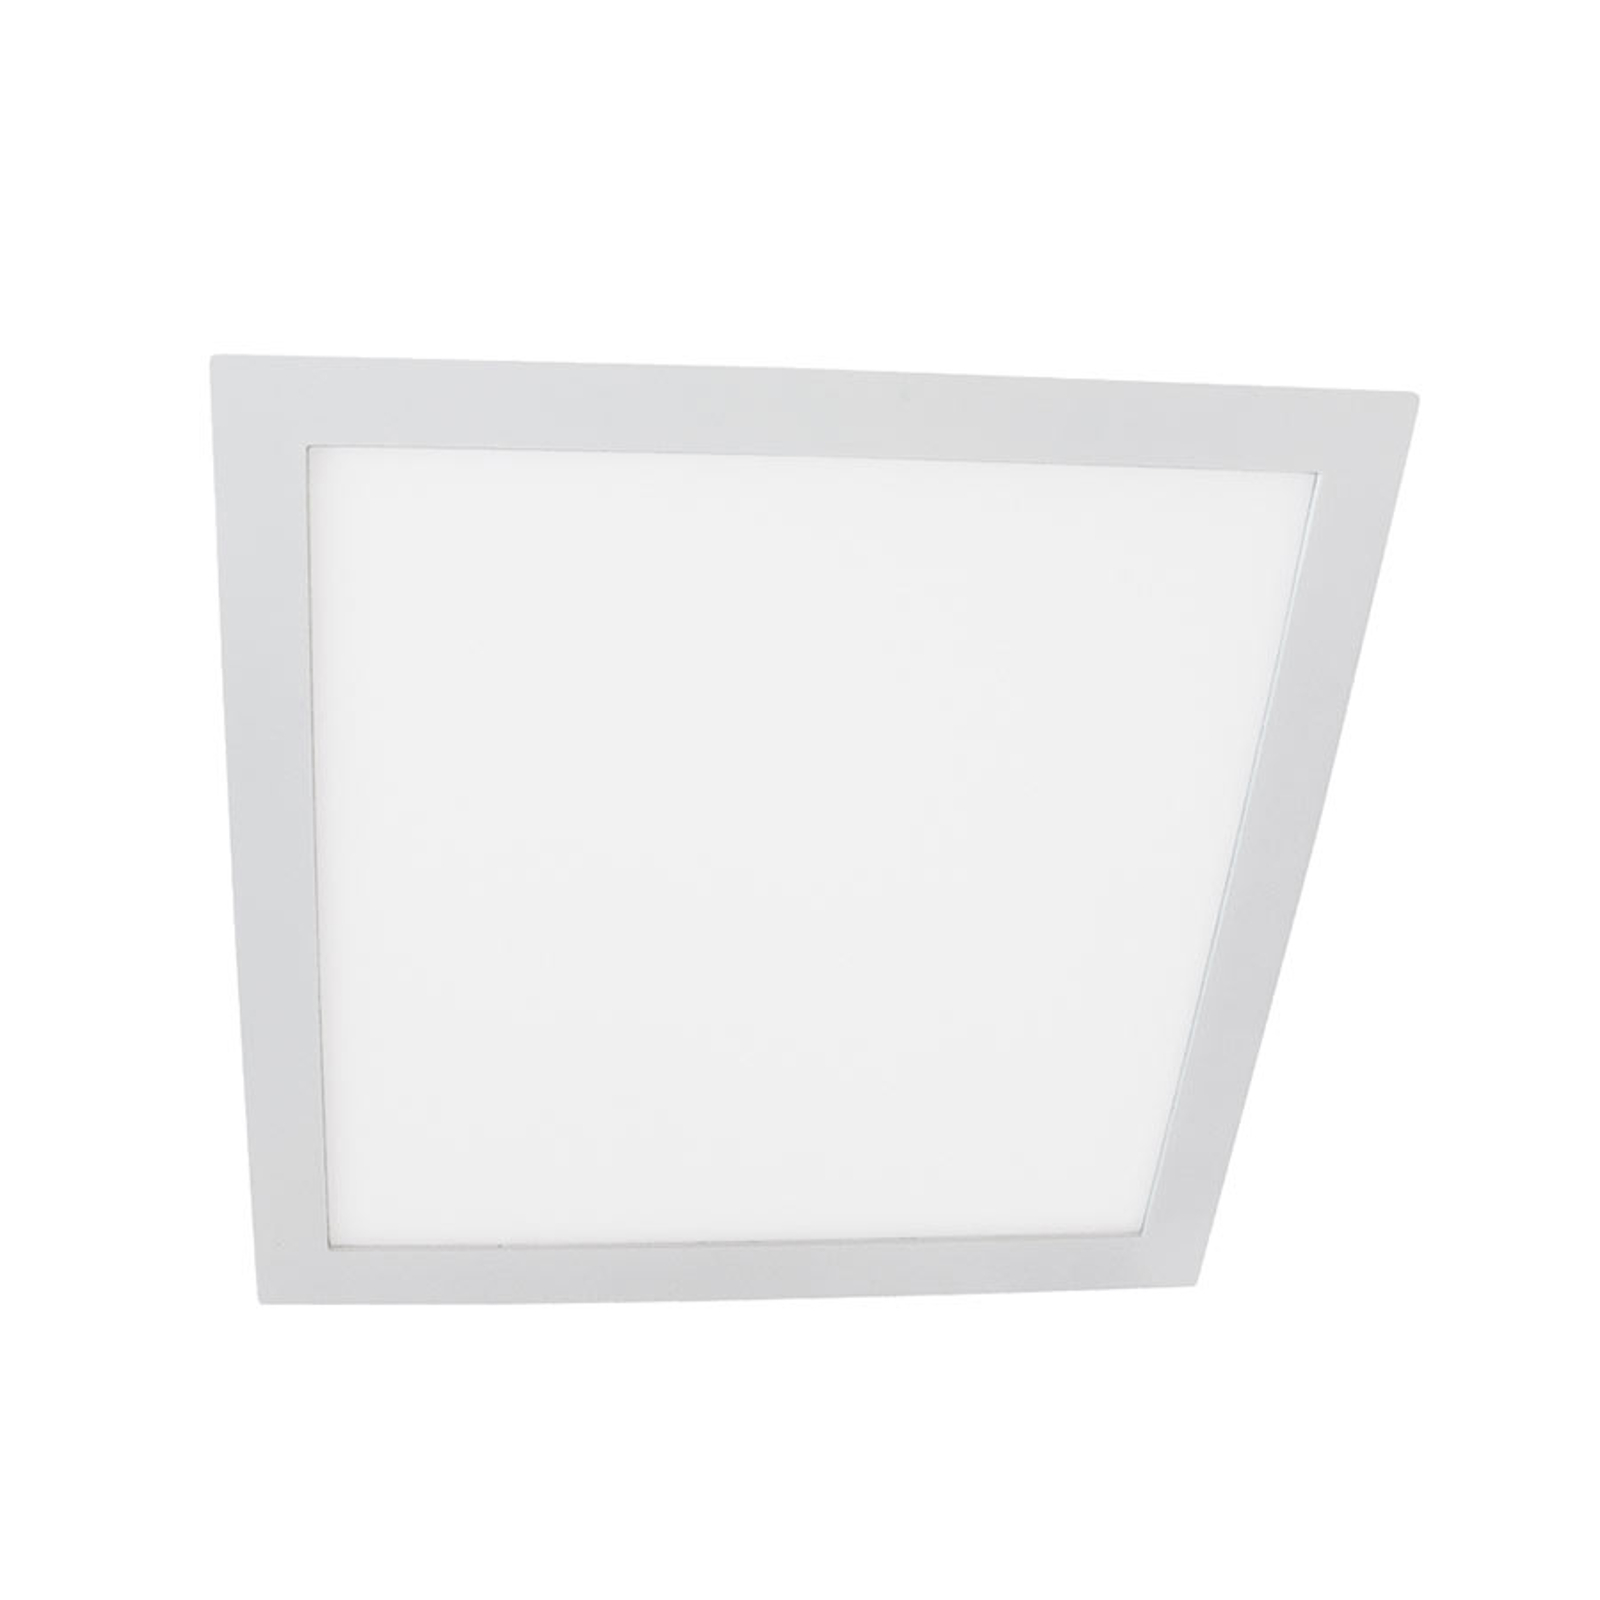 LED-Einbaulampe Moon Square 12W, 4.000K